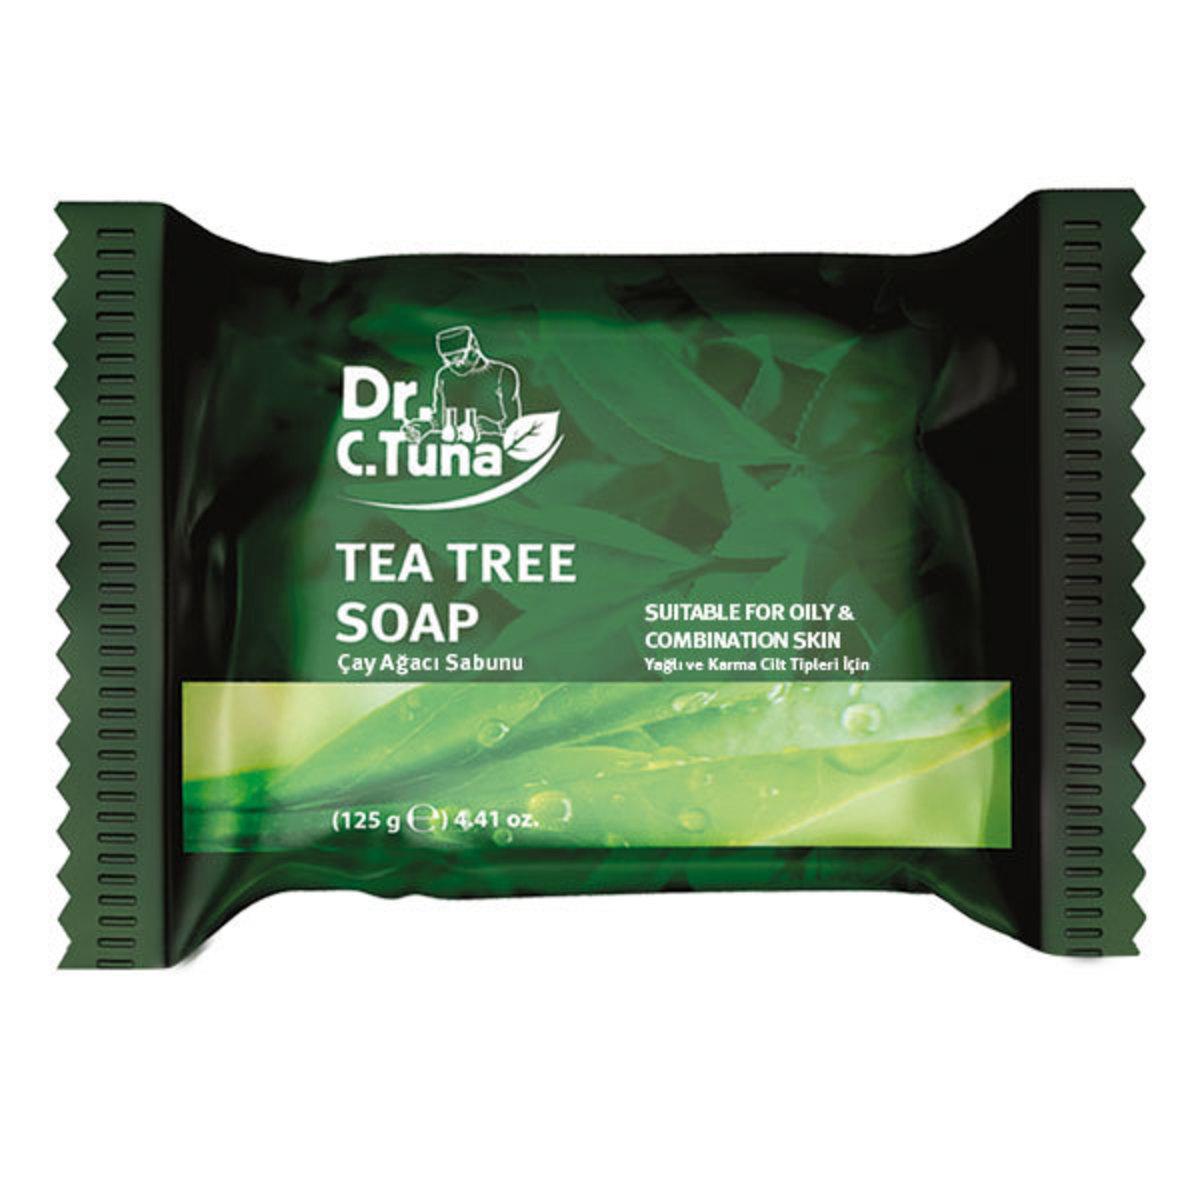 Soap with tea tree oil in it.